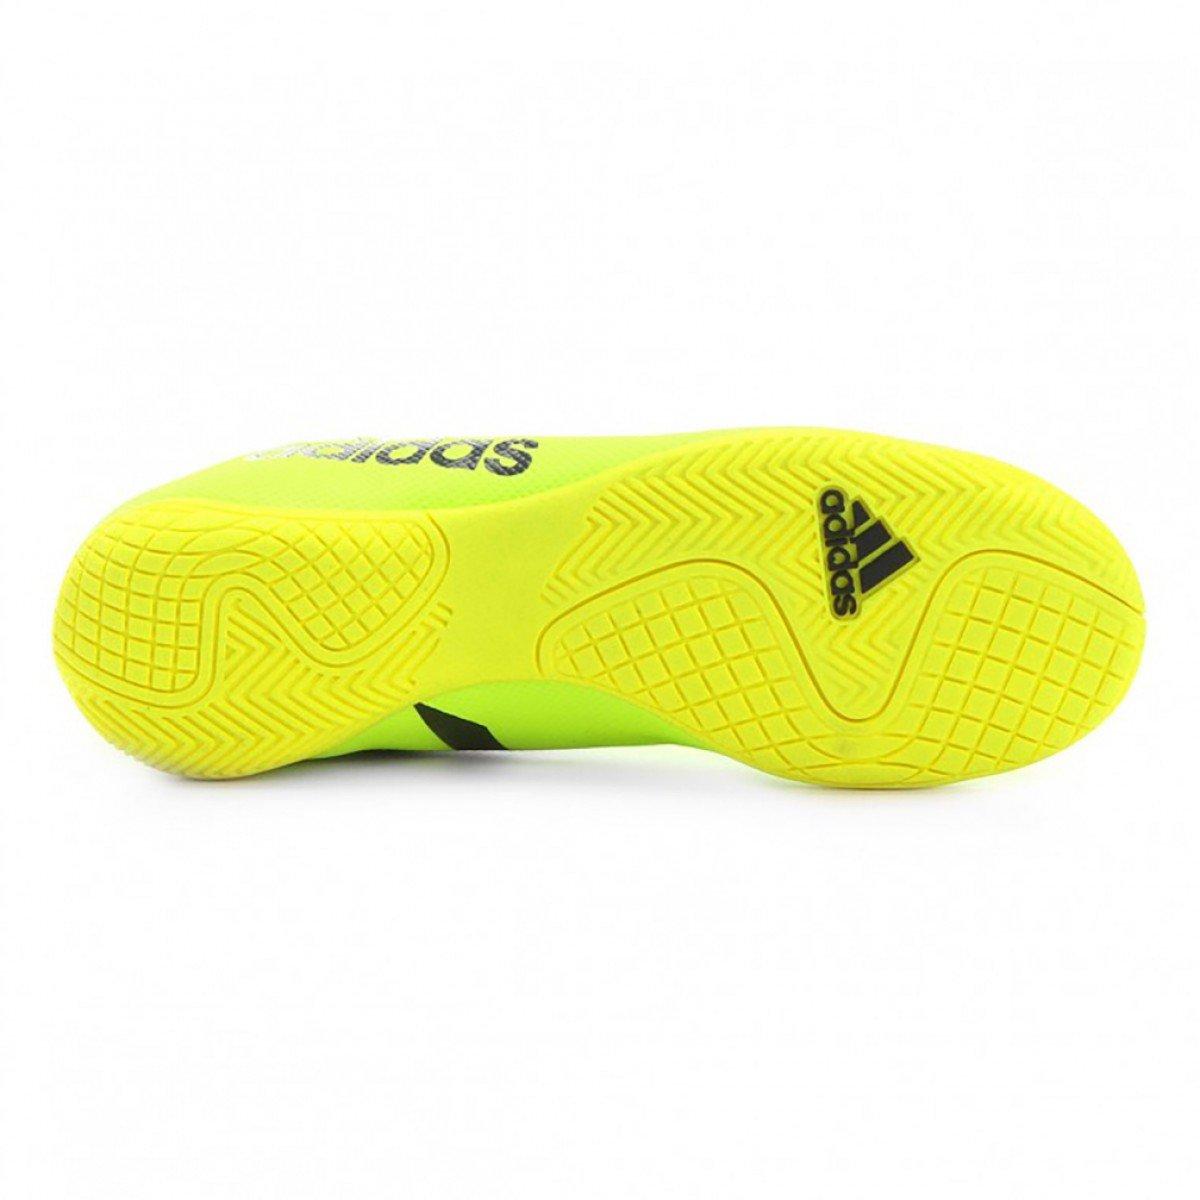 ... Chuteira Futsal Adidas X 17.4 IN Masculina - Verde Limão f1ce60912c253